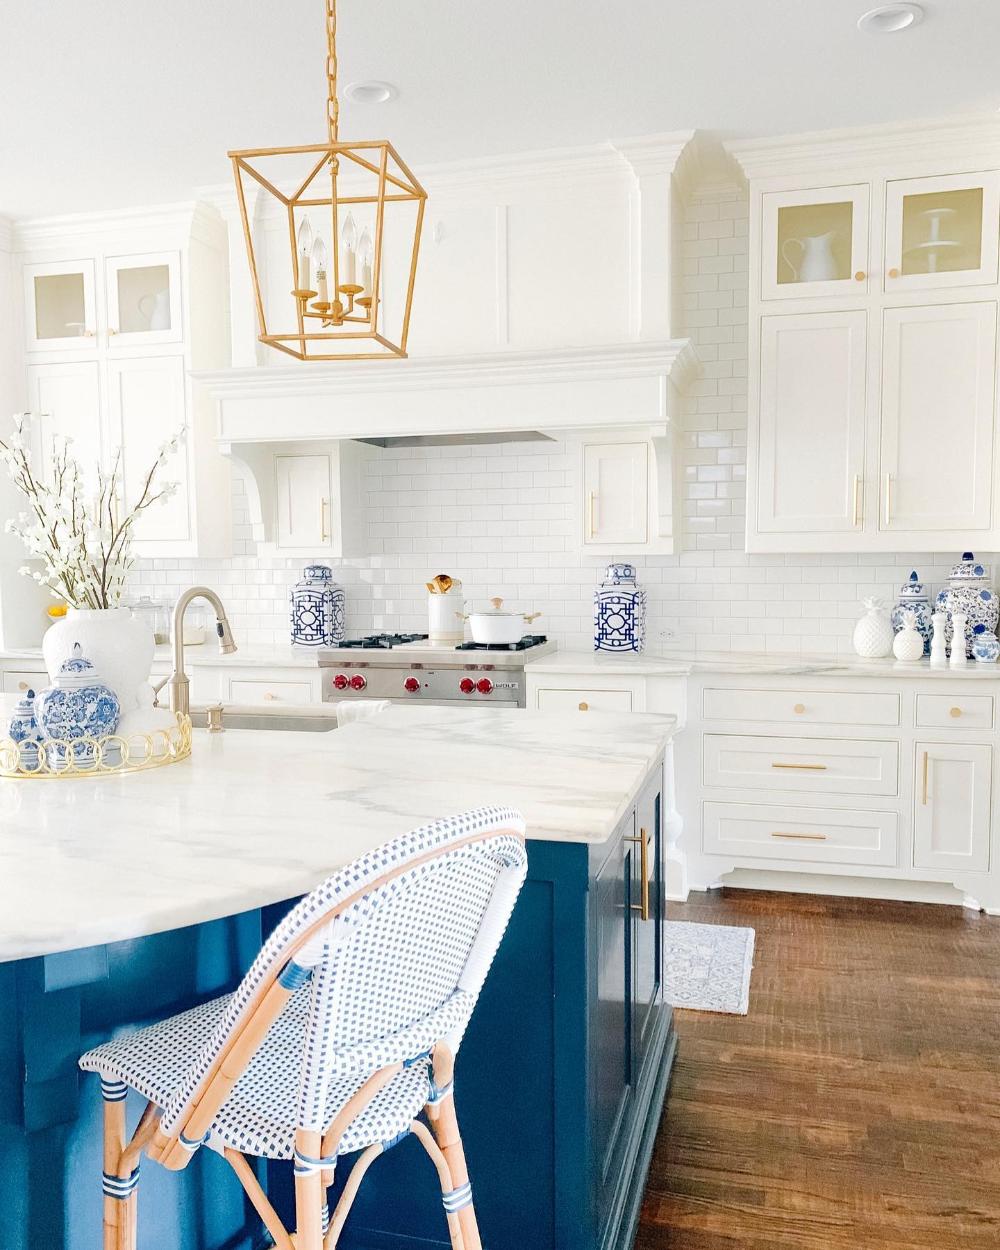 Riviera Bar Counter Stools Home Kitchens Kitchen Island Decor Kitchen Remodel